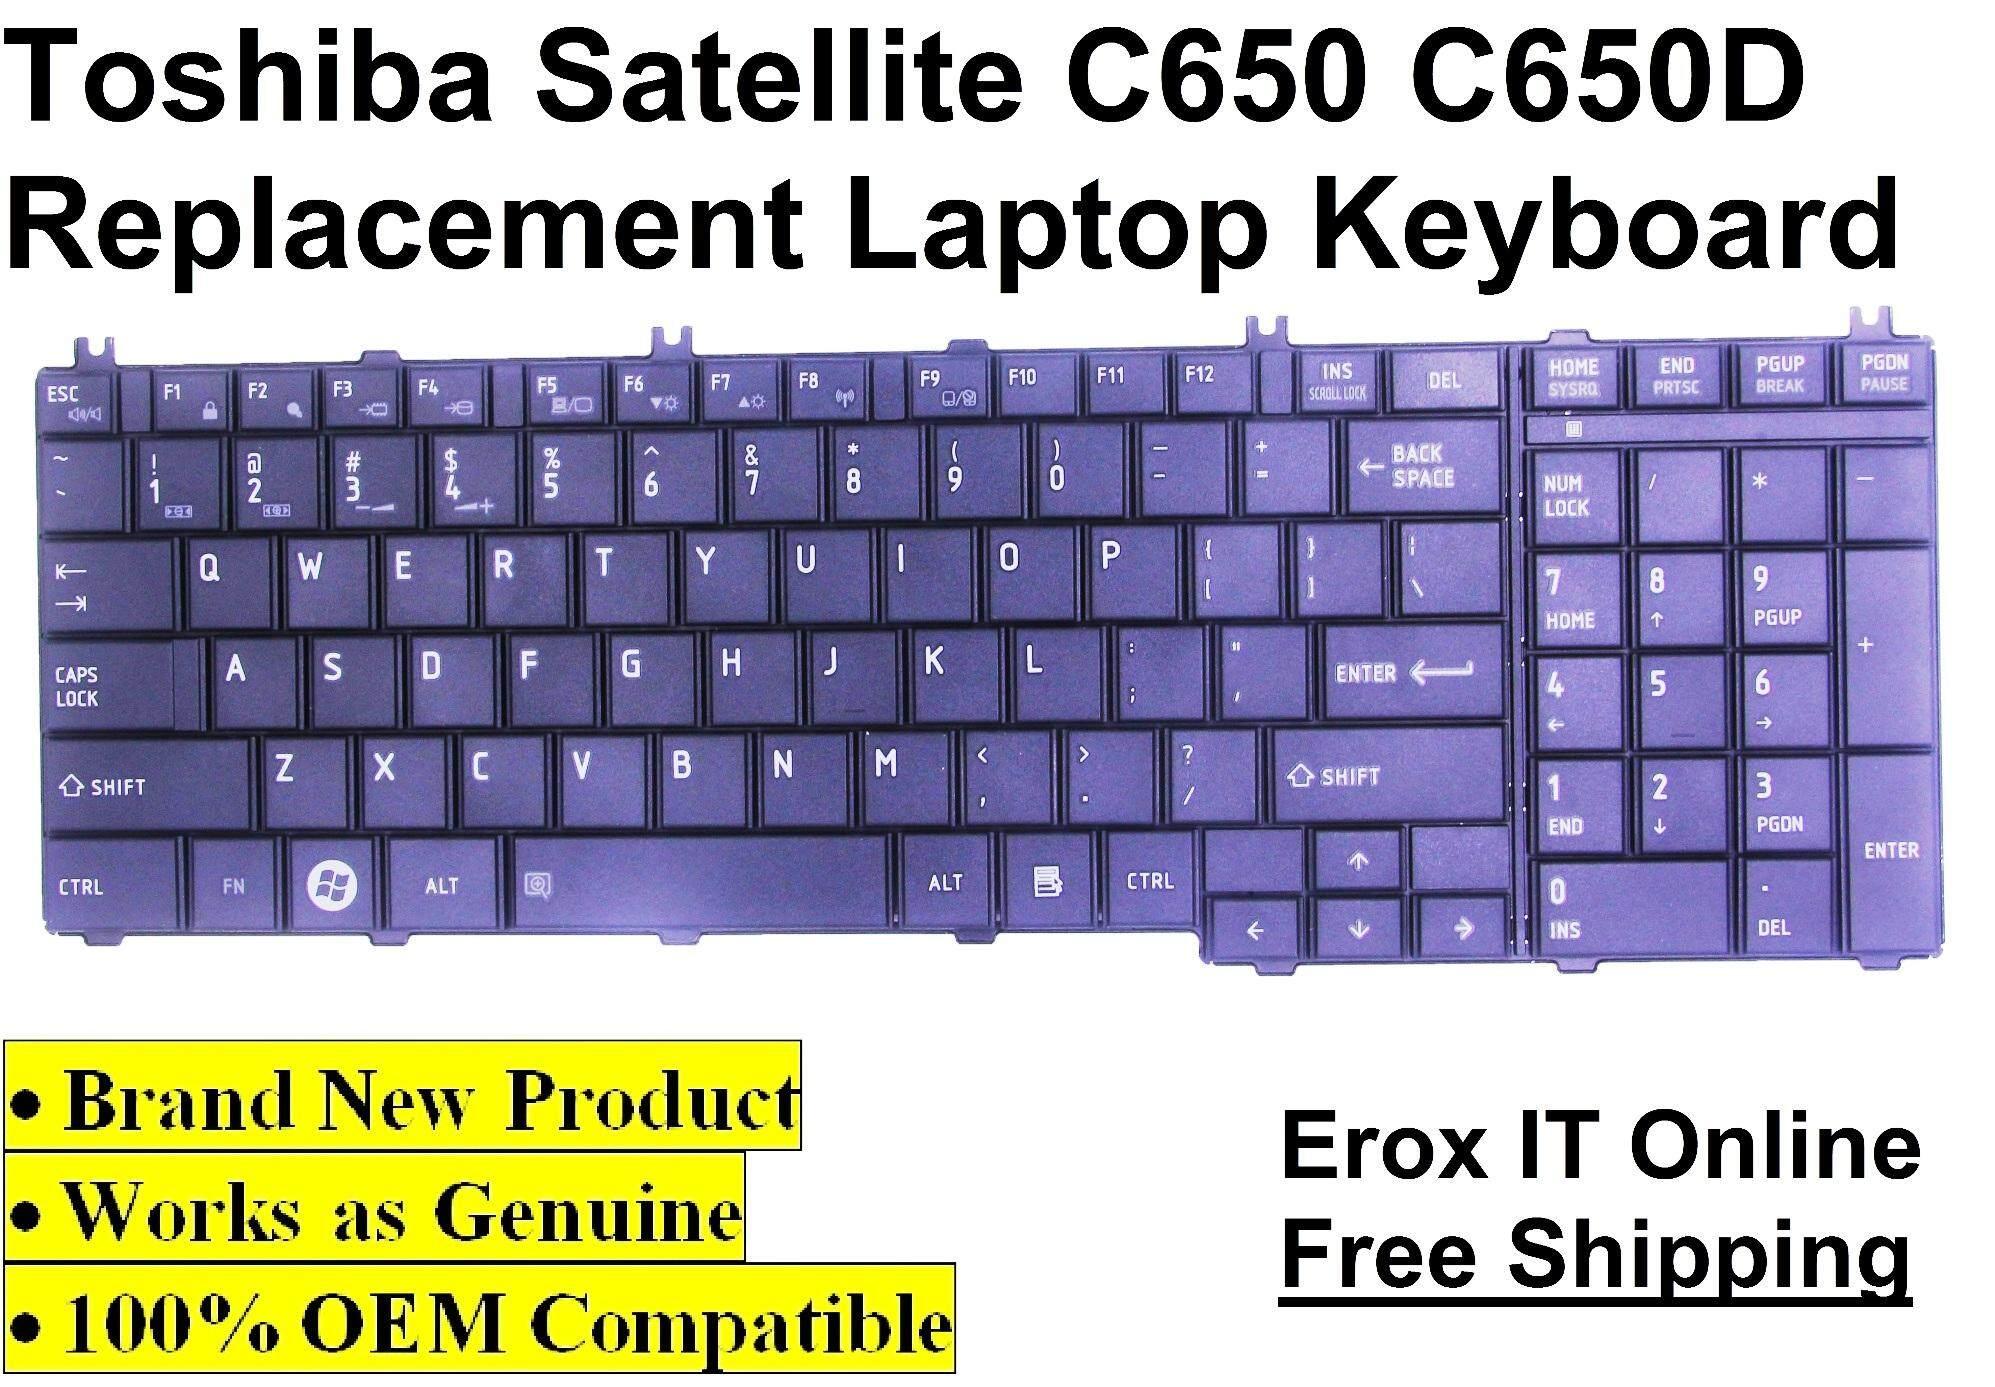 Toshiba Satellite L755 Series OEM Replacement Keyboard /Toshiba C650 Replacement Laptop Keyboard Malaysia